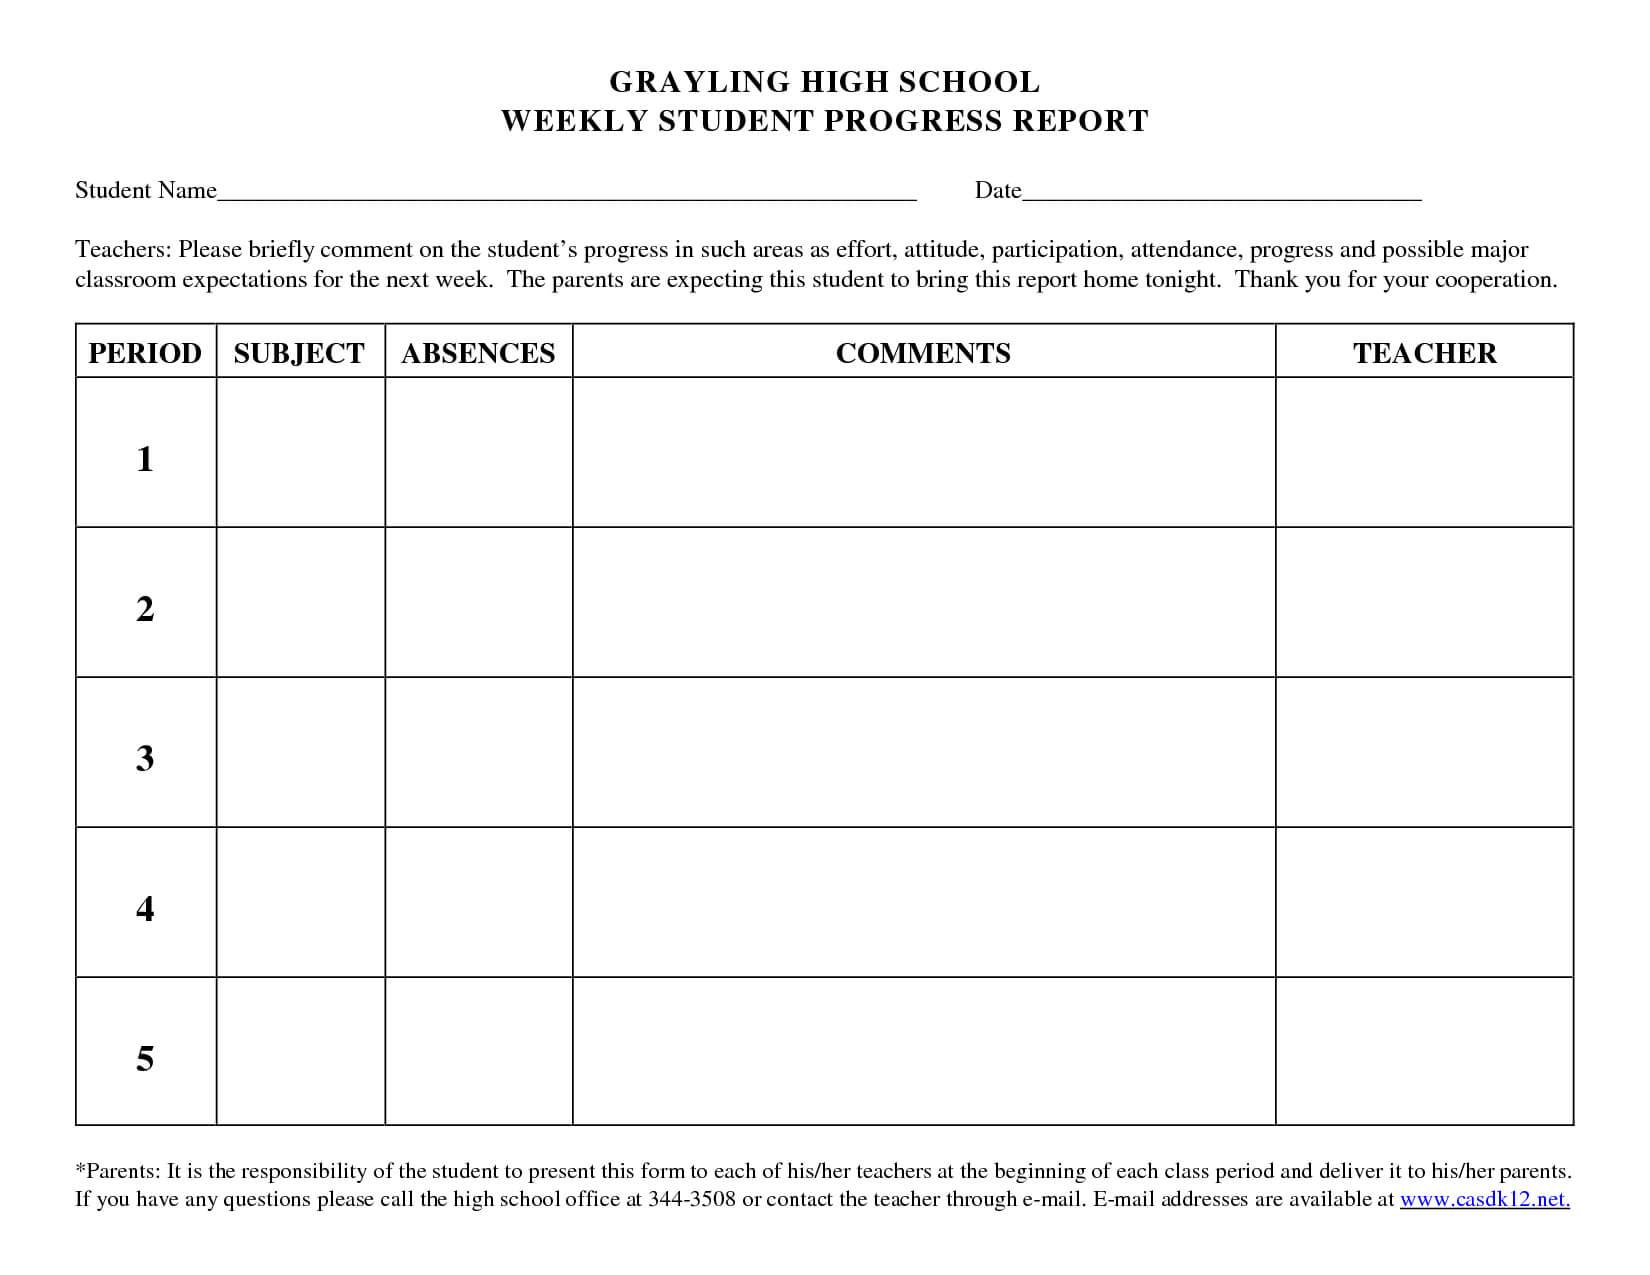 020 Template Ideas Student Progress Report School 412698 Regarding School Progress Report Template